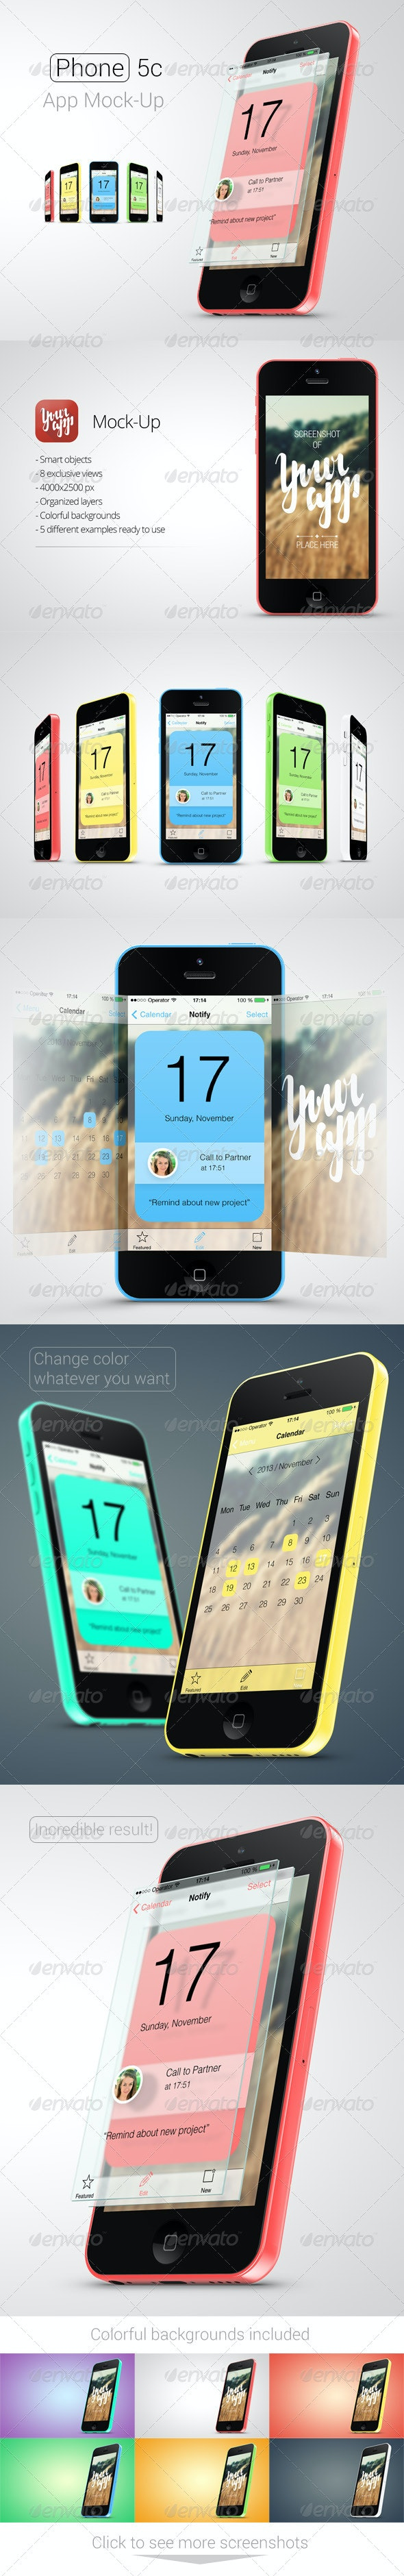 Phone 5c App Mock-Up - Mobile Displays